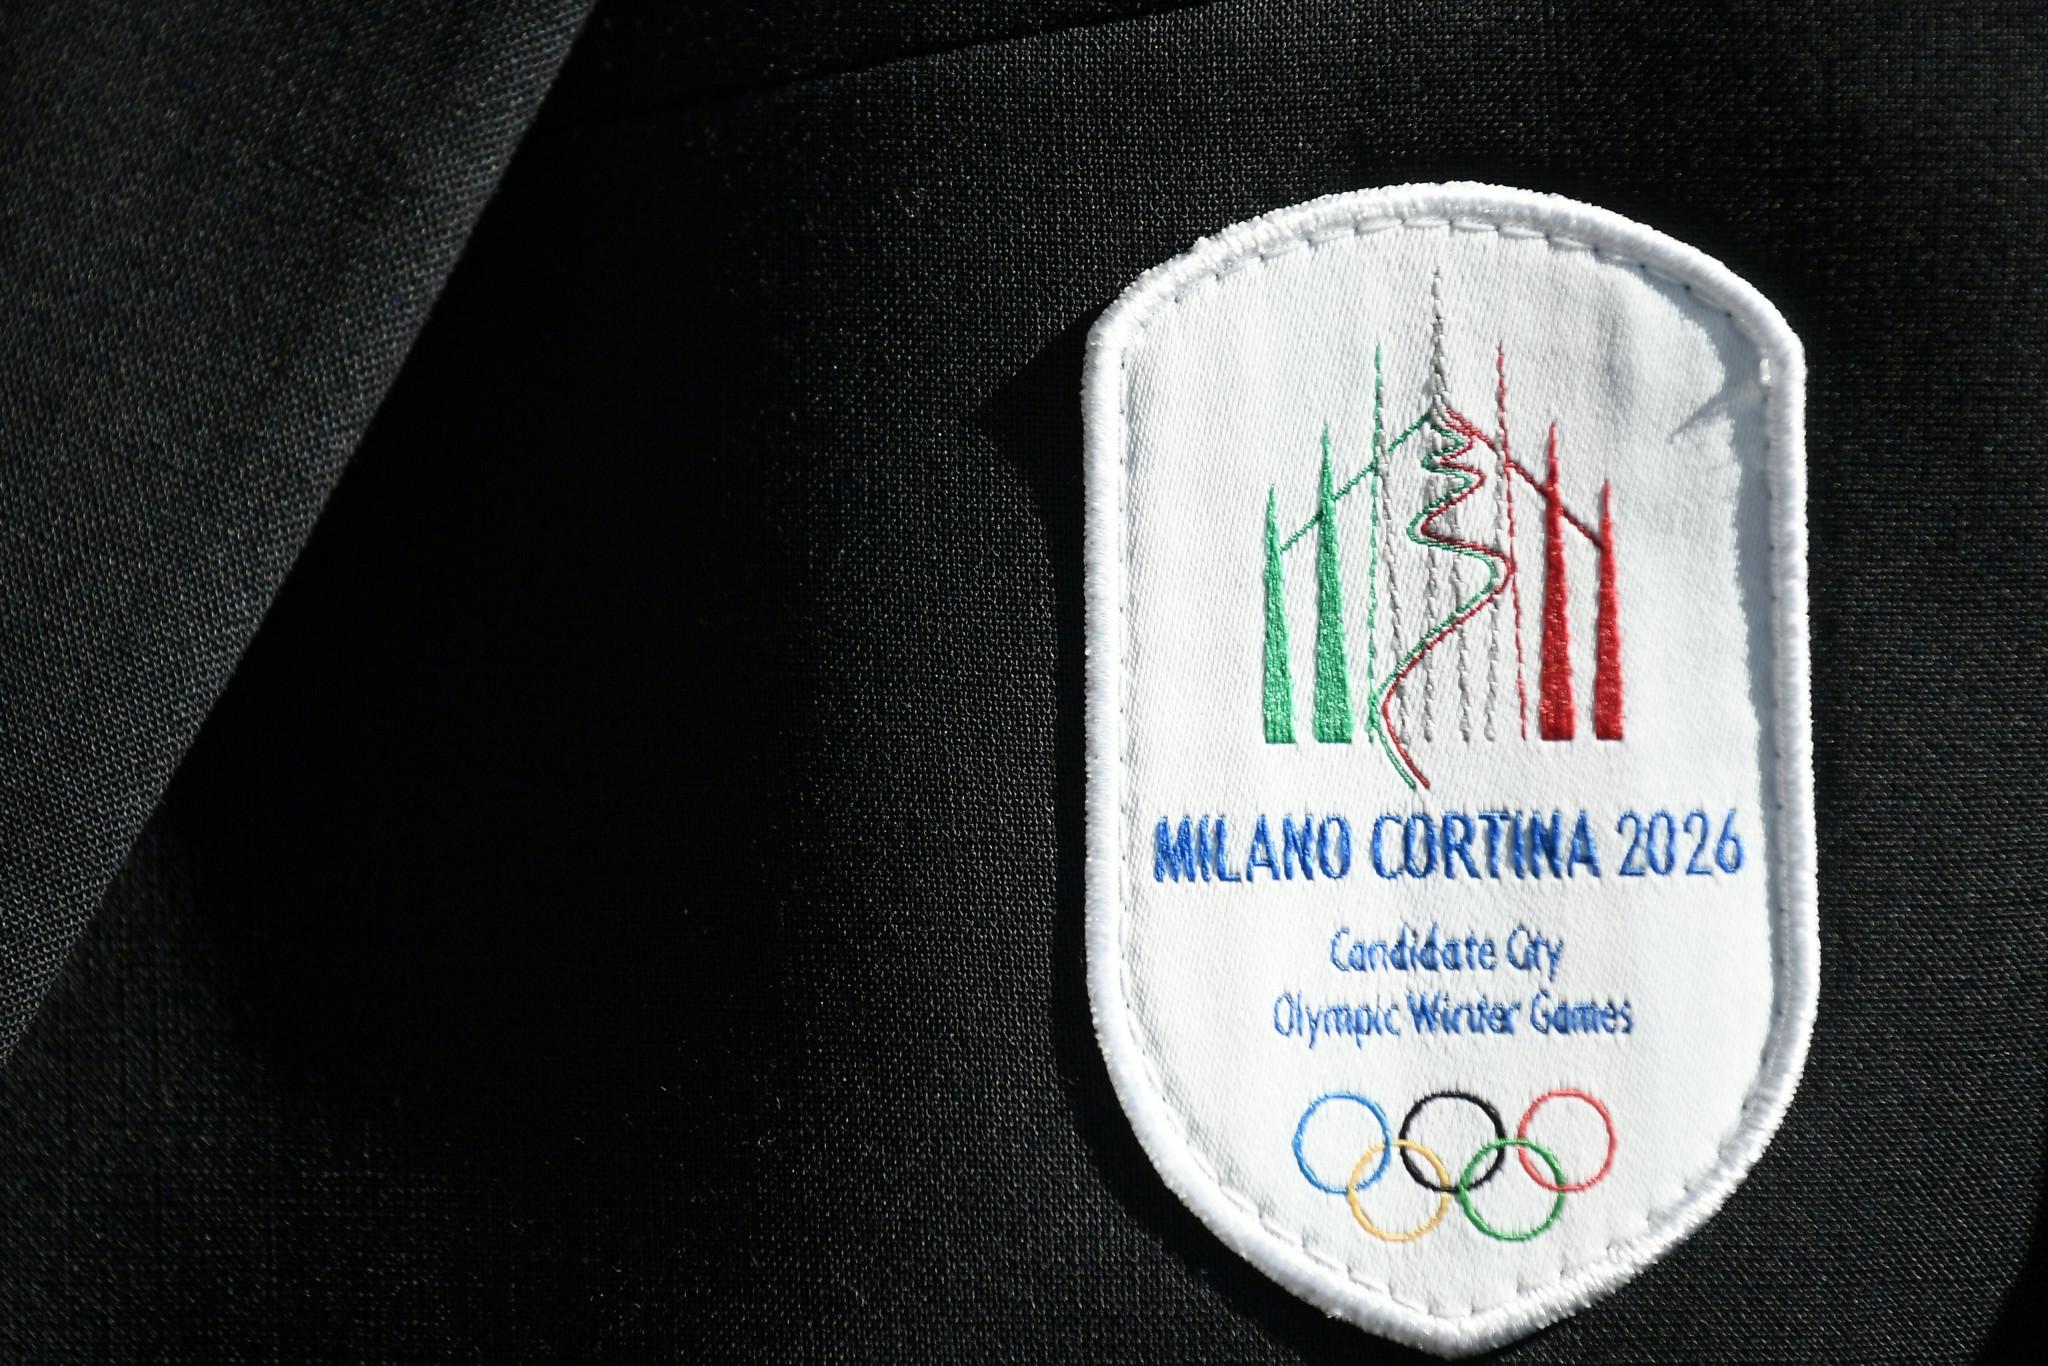 Project Corba set to rejuvenate neighbourhood prior to Milan Cortina 2026 Winter Olympic Games